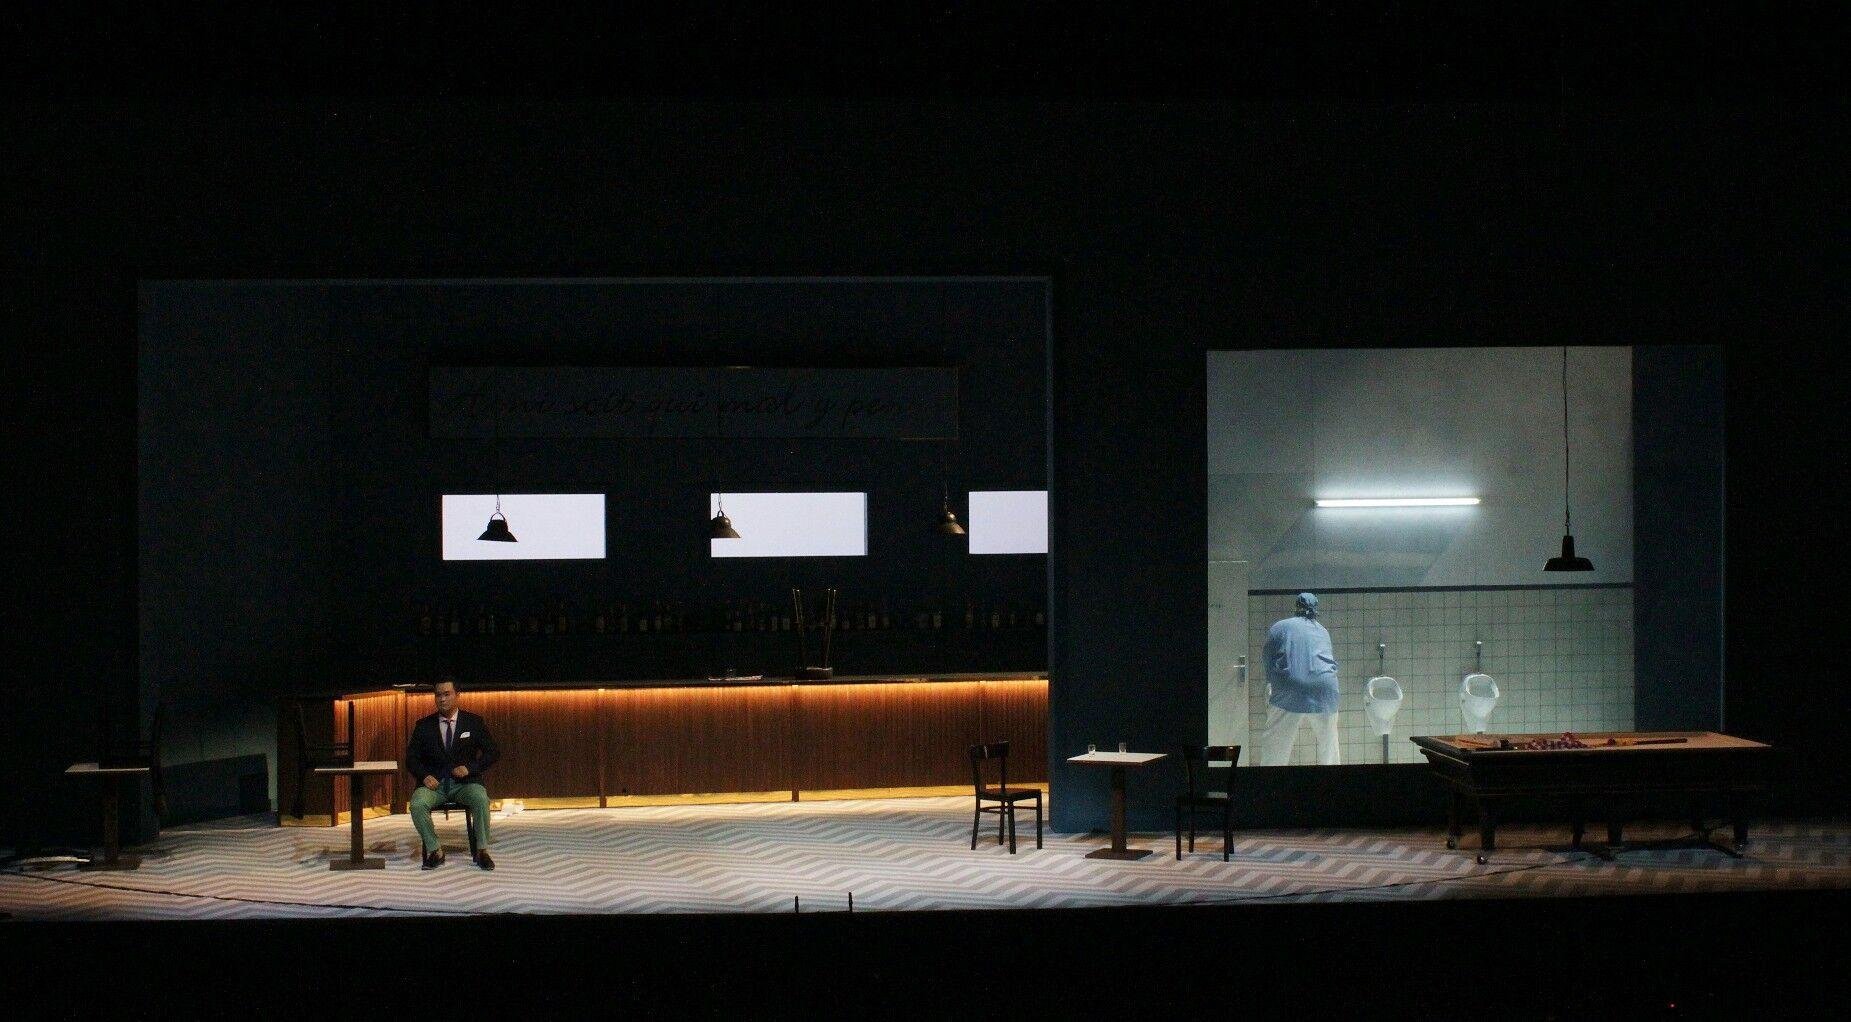 Falstaff-Opera-by-Giuseppe-Verdi-directed-by-Jacopo-Spirei- in-Karlsruhe-5